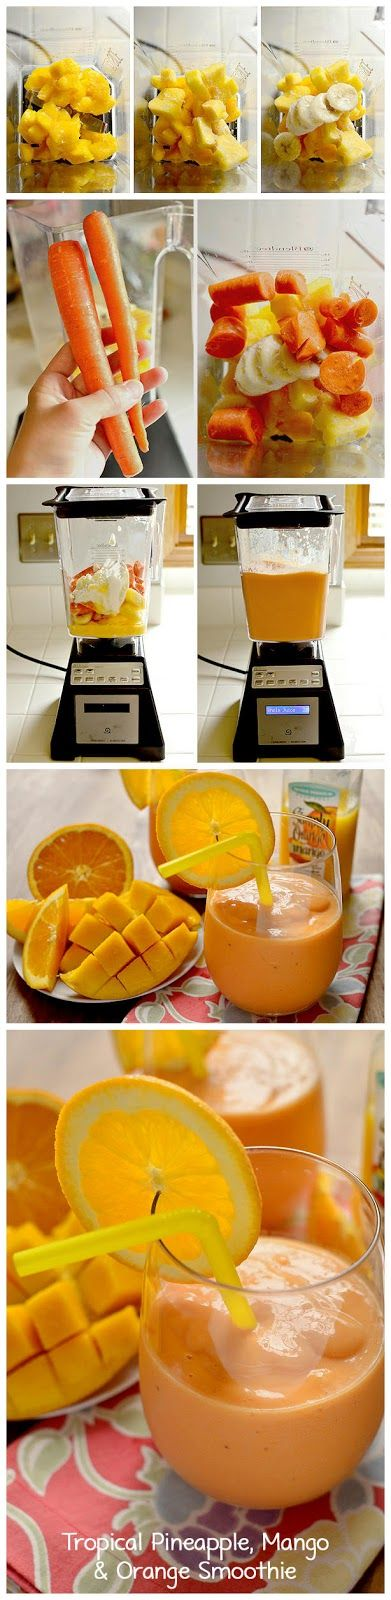 Tropical Pineapple, Mango & Orange Smoothie